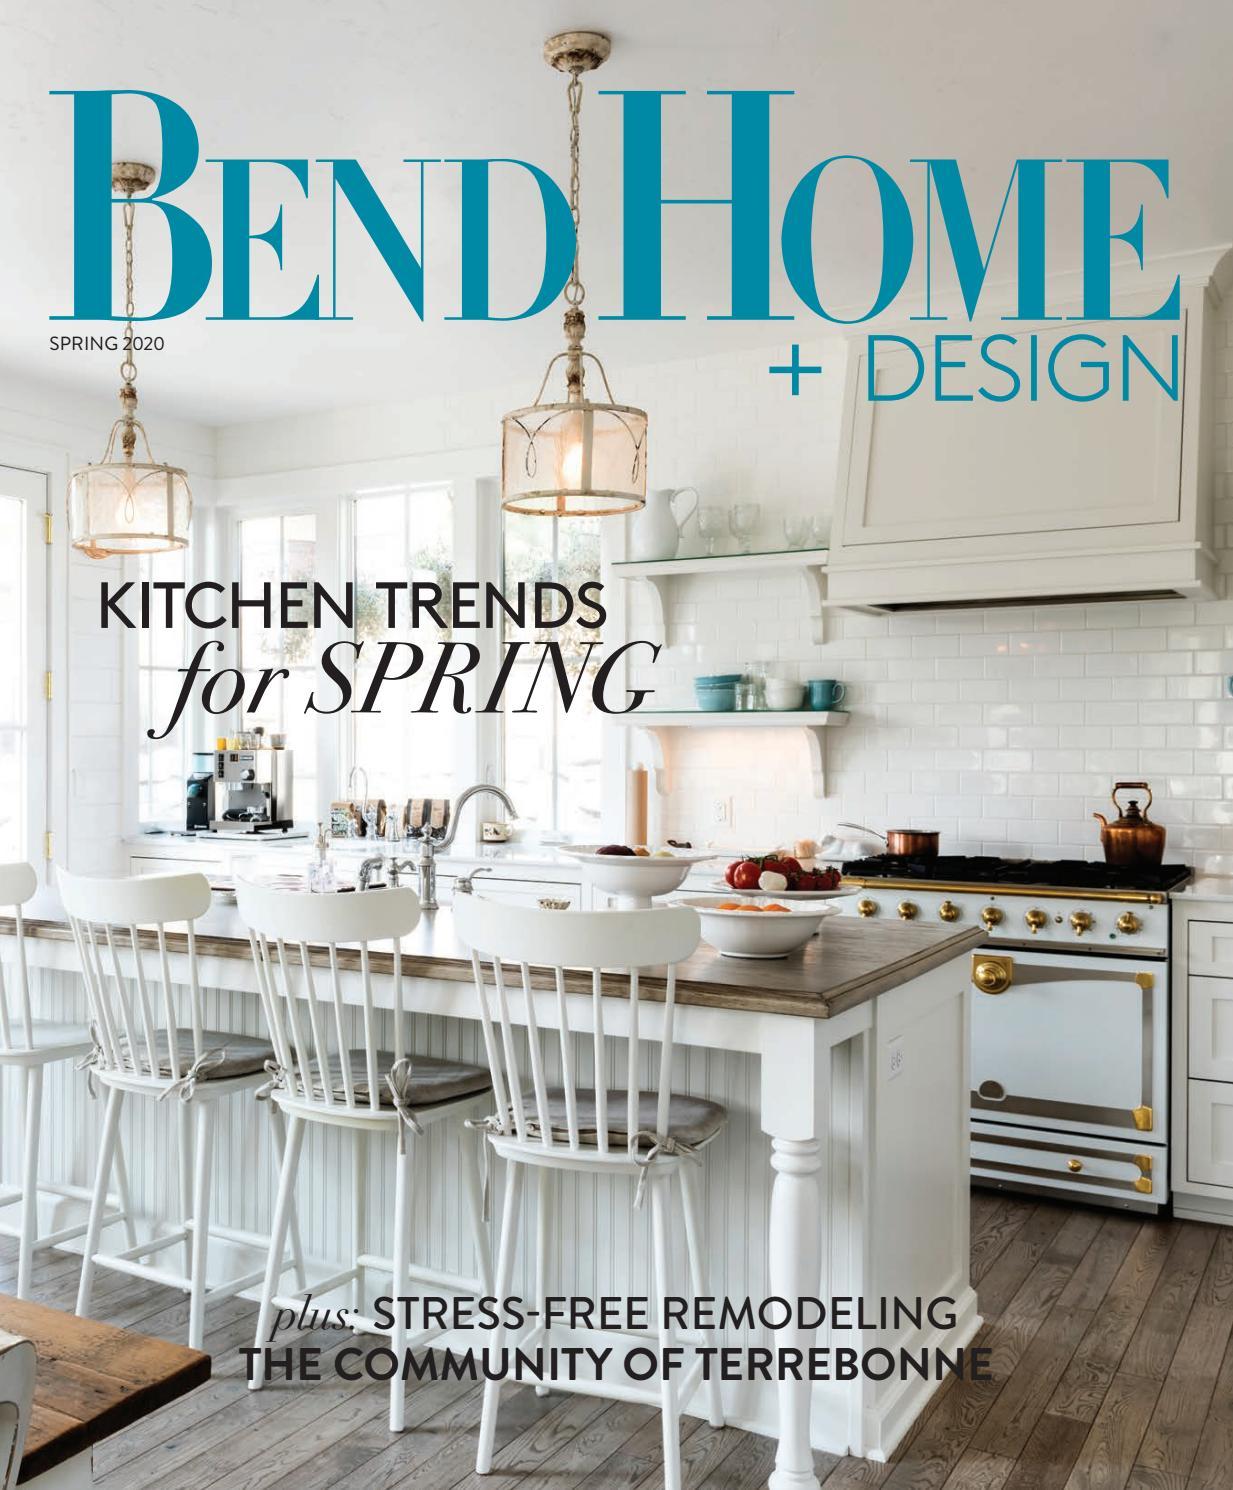 Bend Home Design Spring 2020 By Oregon Media Issuu